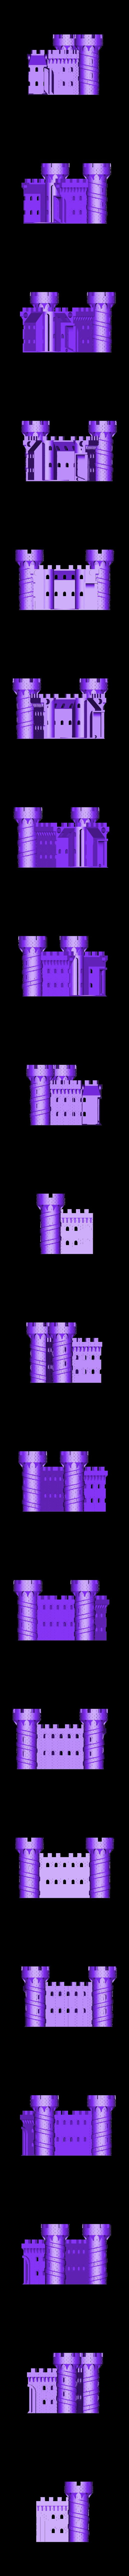 Castle_Bottom_Right.stl Download free STL file Castle Dedede - Amiibo Prop • 3D printable object, ChrisBobo